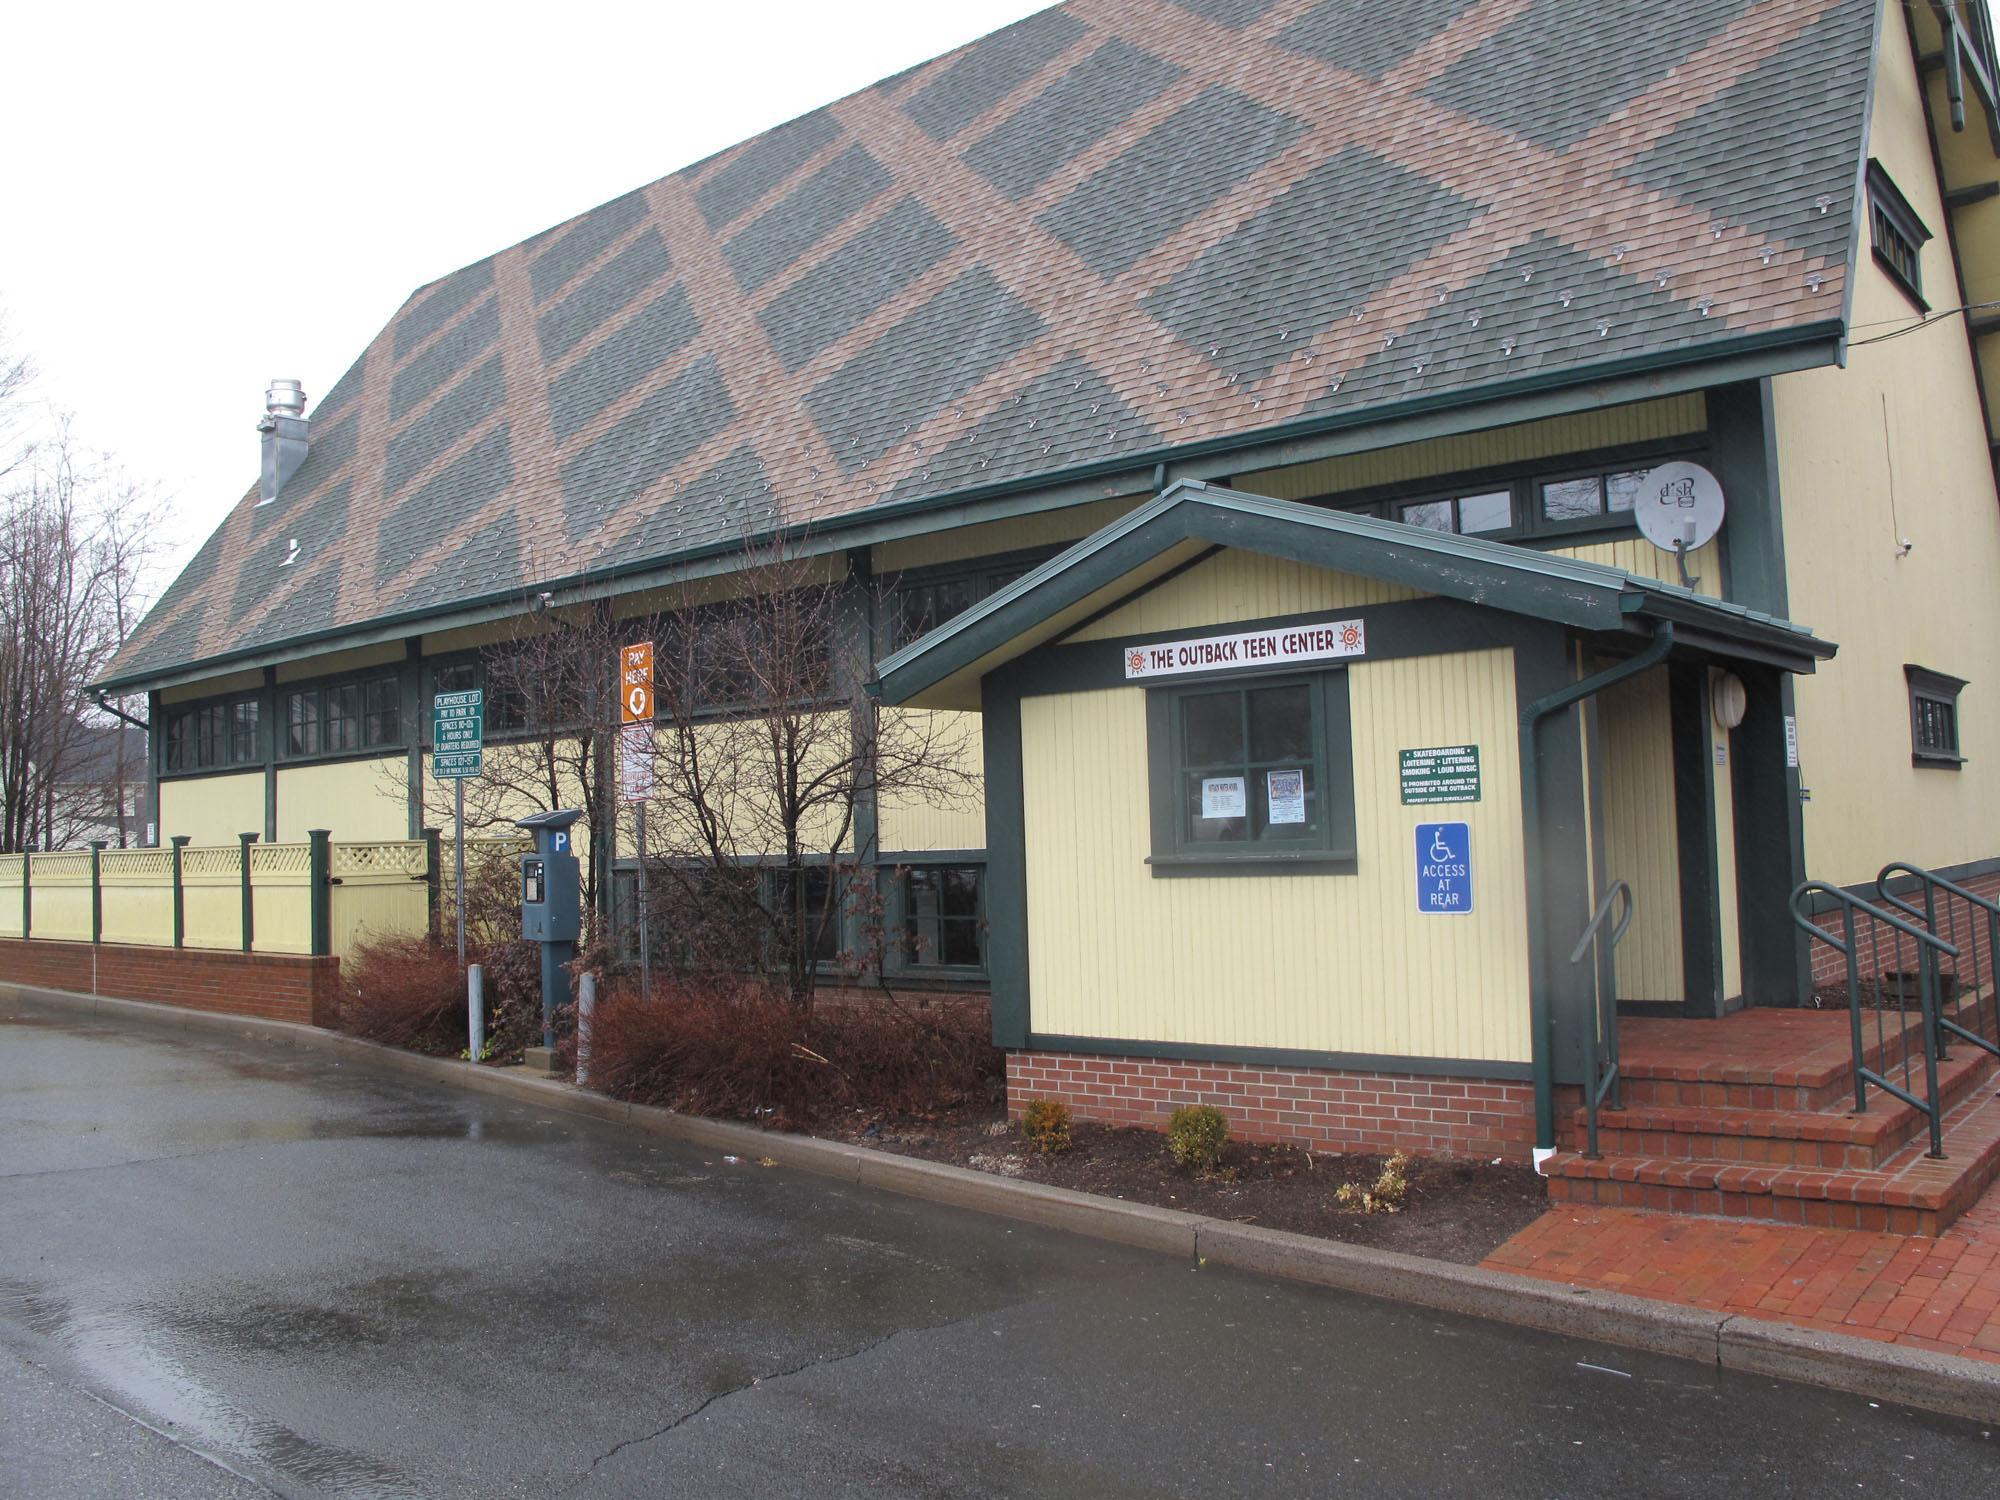 New Canaan Teen Center Inc - nonprofitfactscom